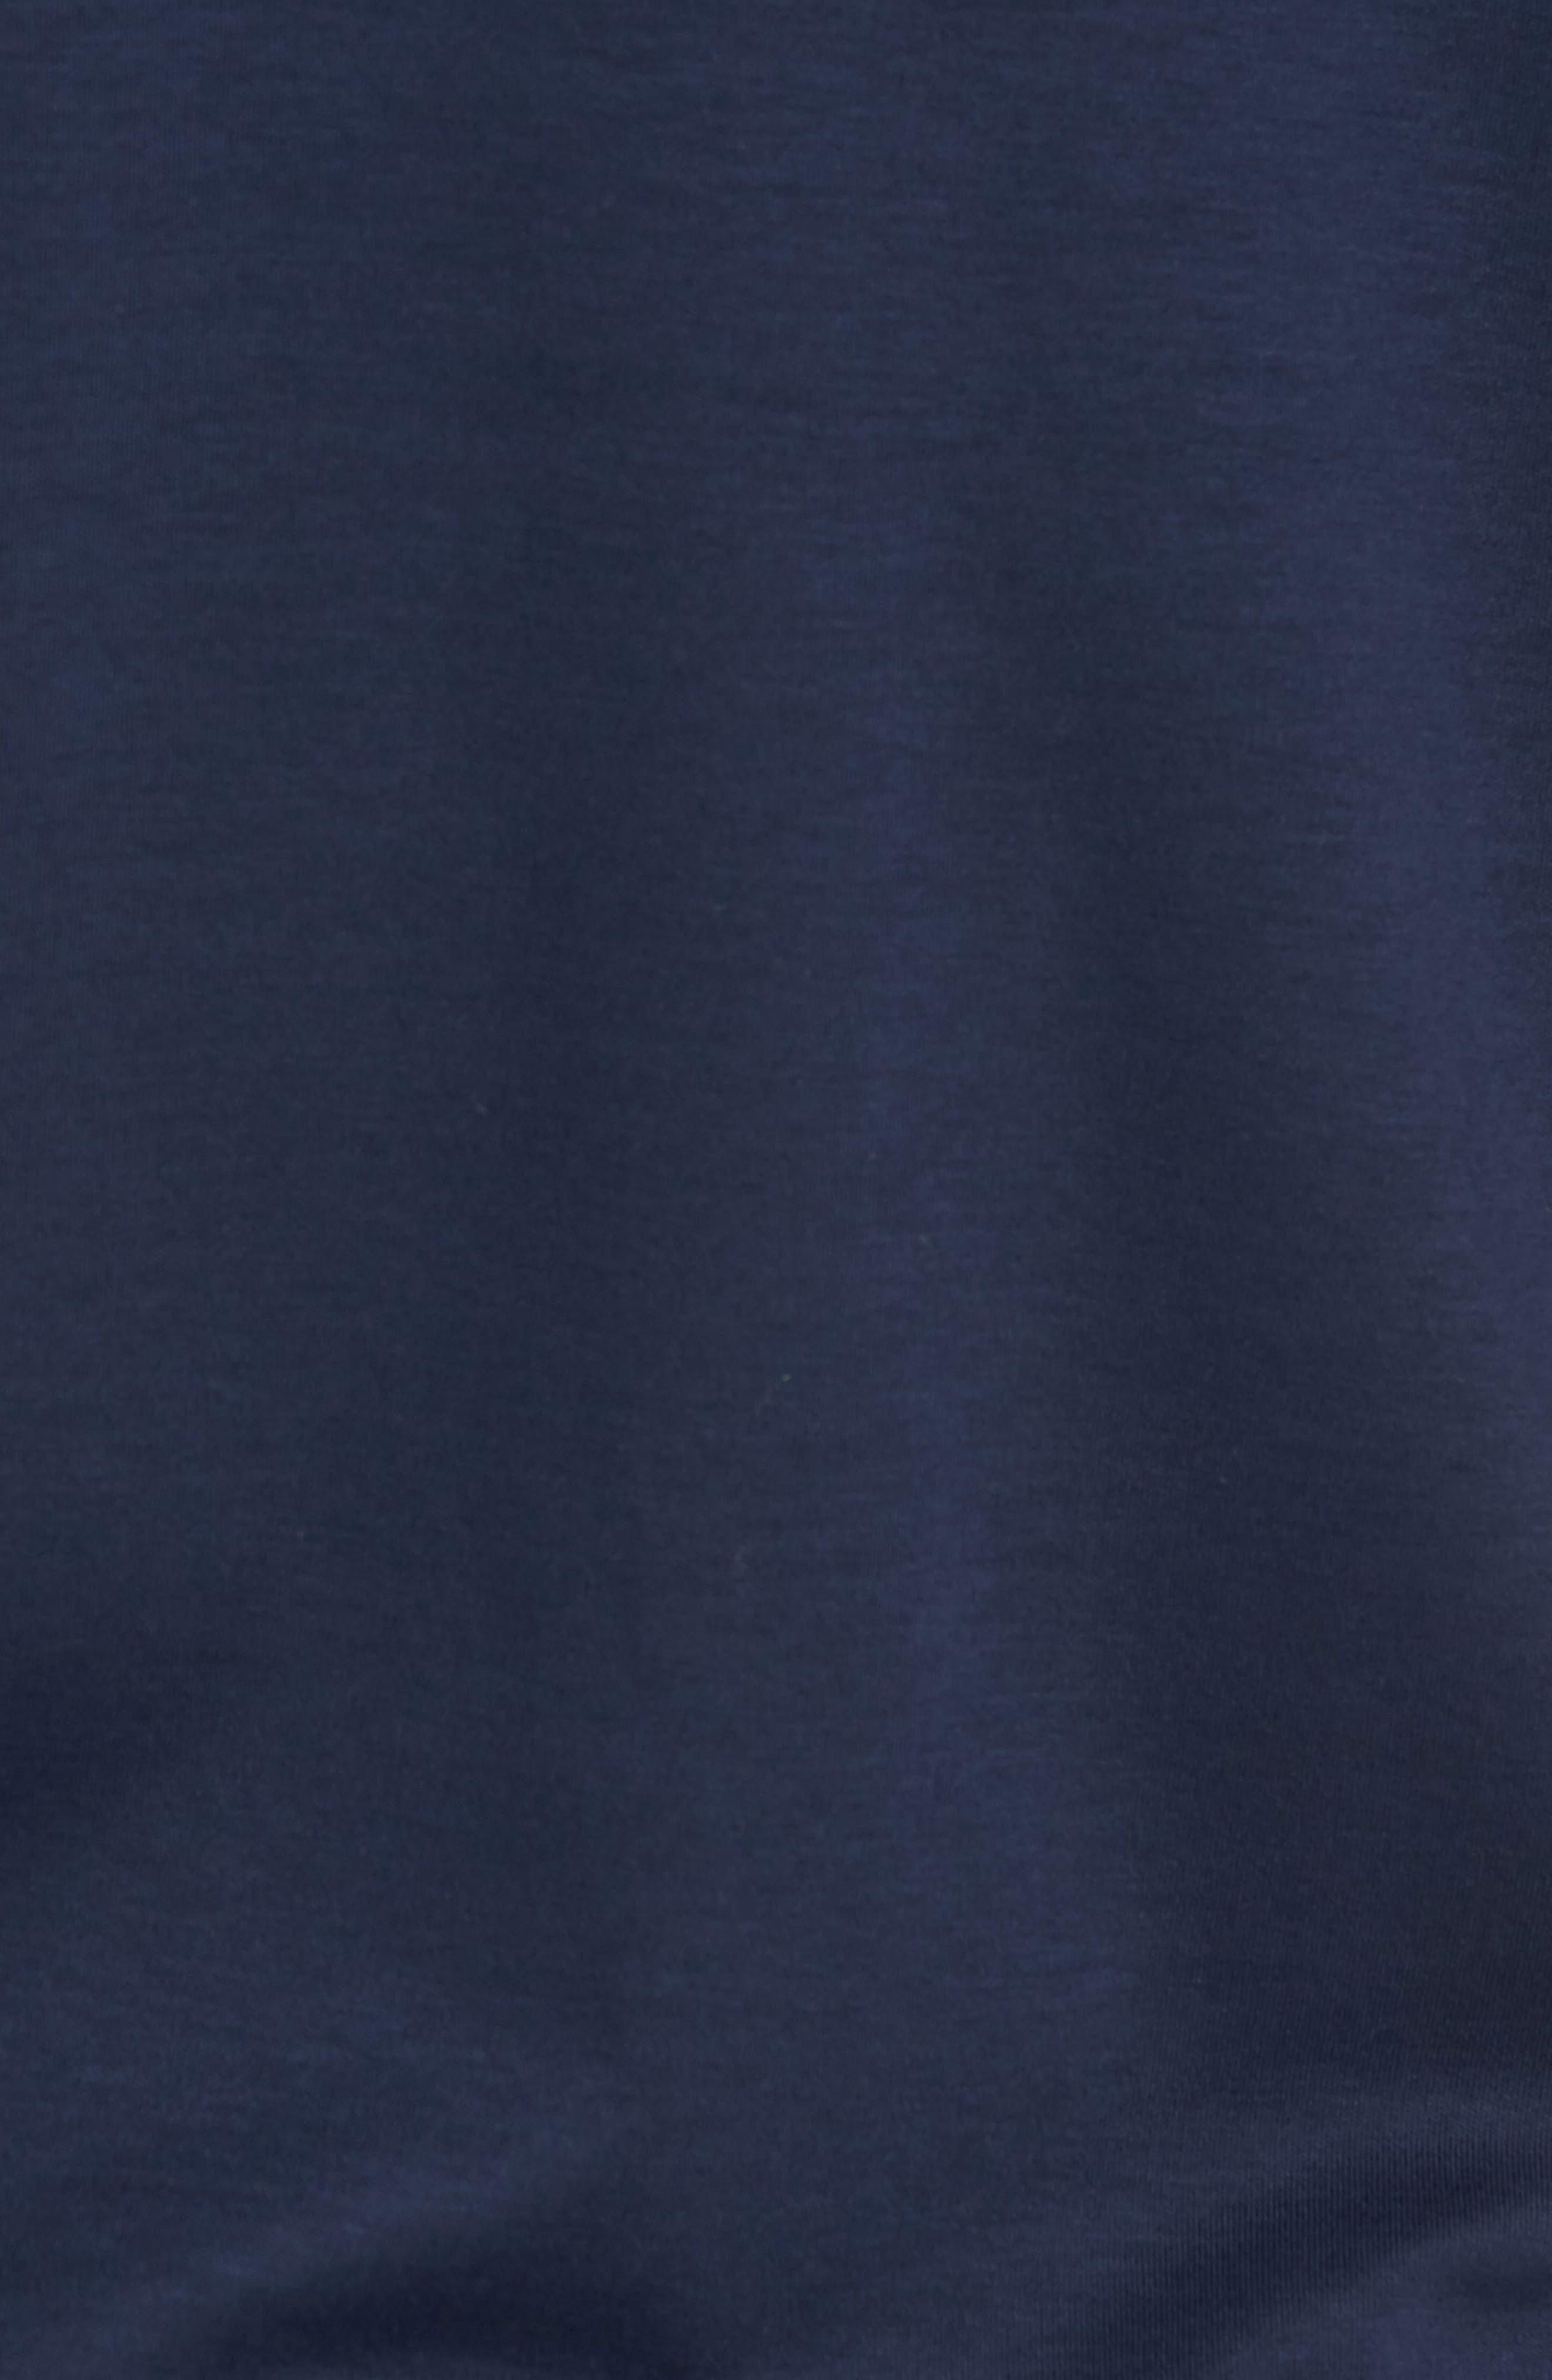 Pohl Polo Shirt,                             Alternate thumbnail 5, color,                             Blue